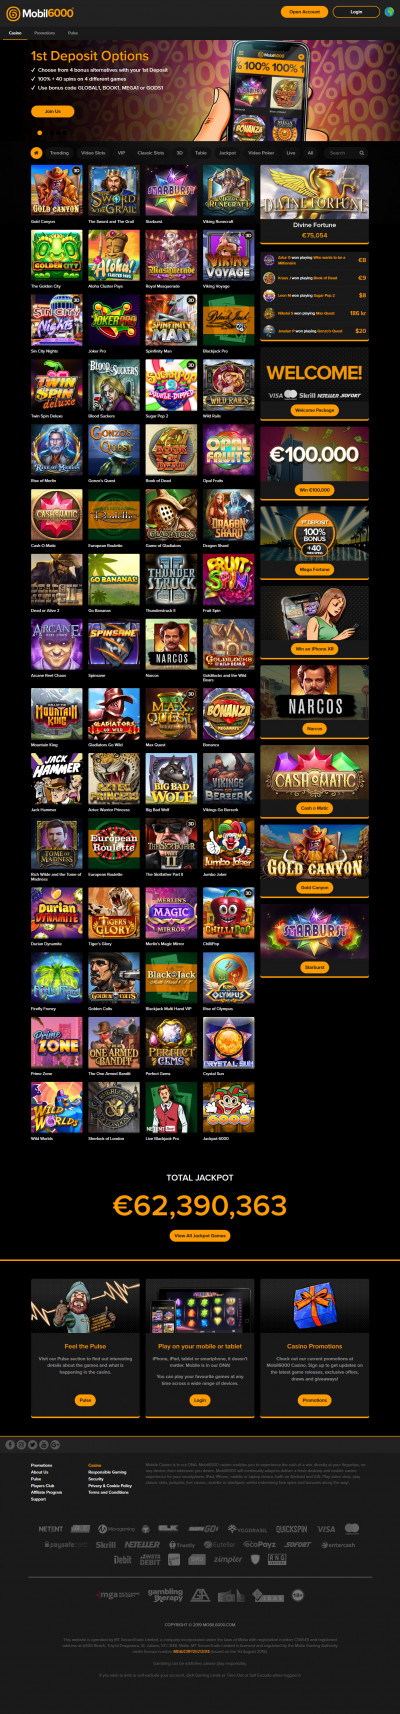 Mobil6000 Casino Screenshot